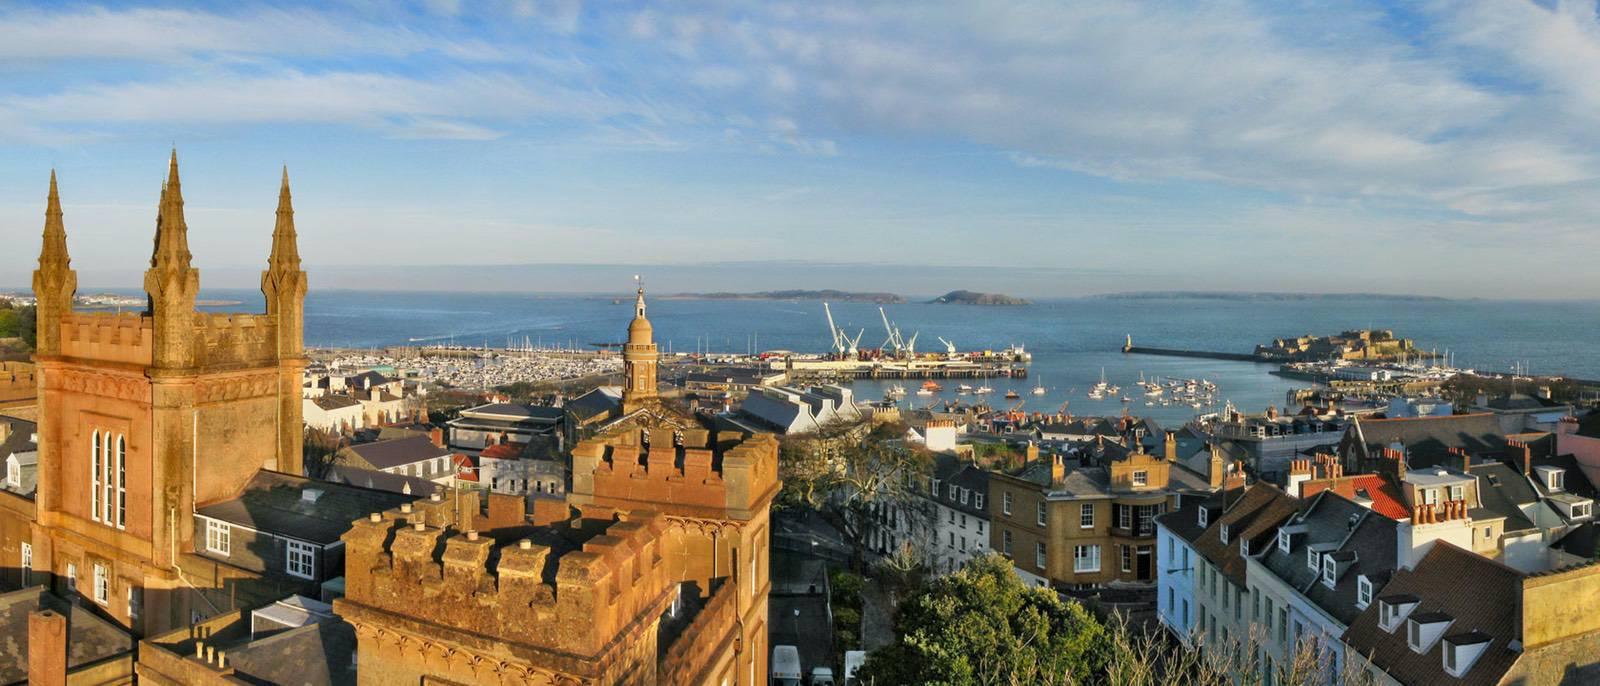 St-Peter-Port-Guernsey-Channel-Islands-1680x720